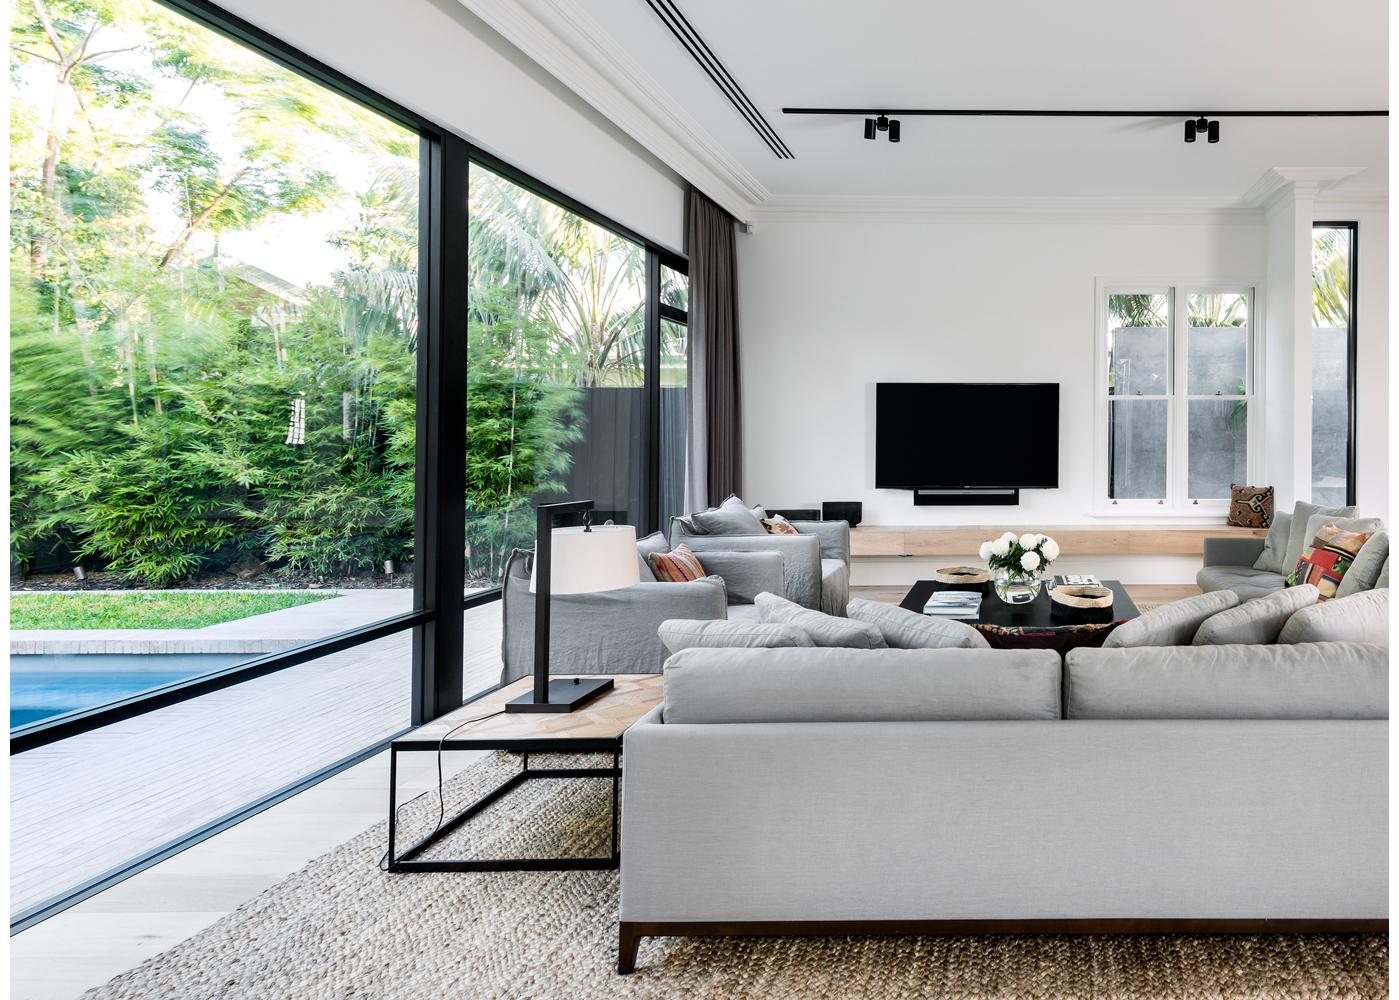 maek-luxury-home-design-inspiration-mosmanpark-27m-gallery-8.jpg